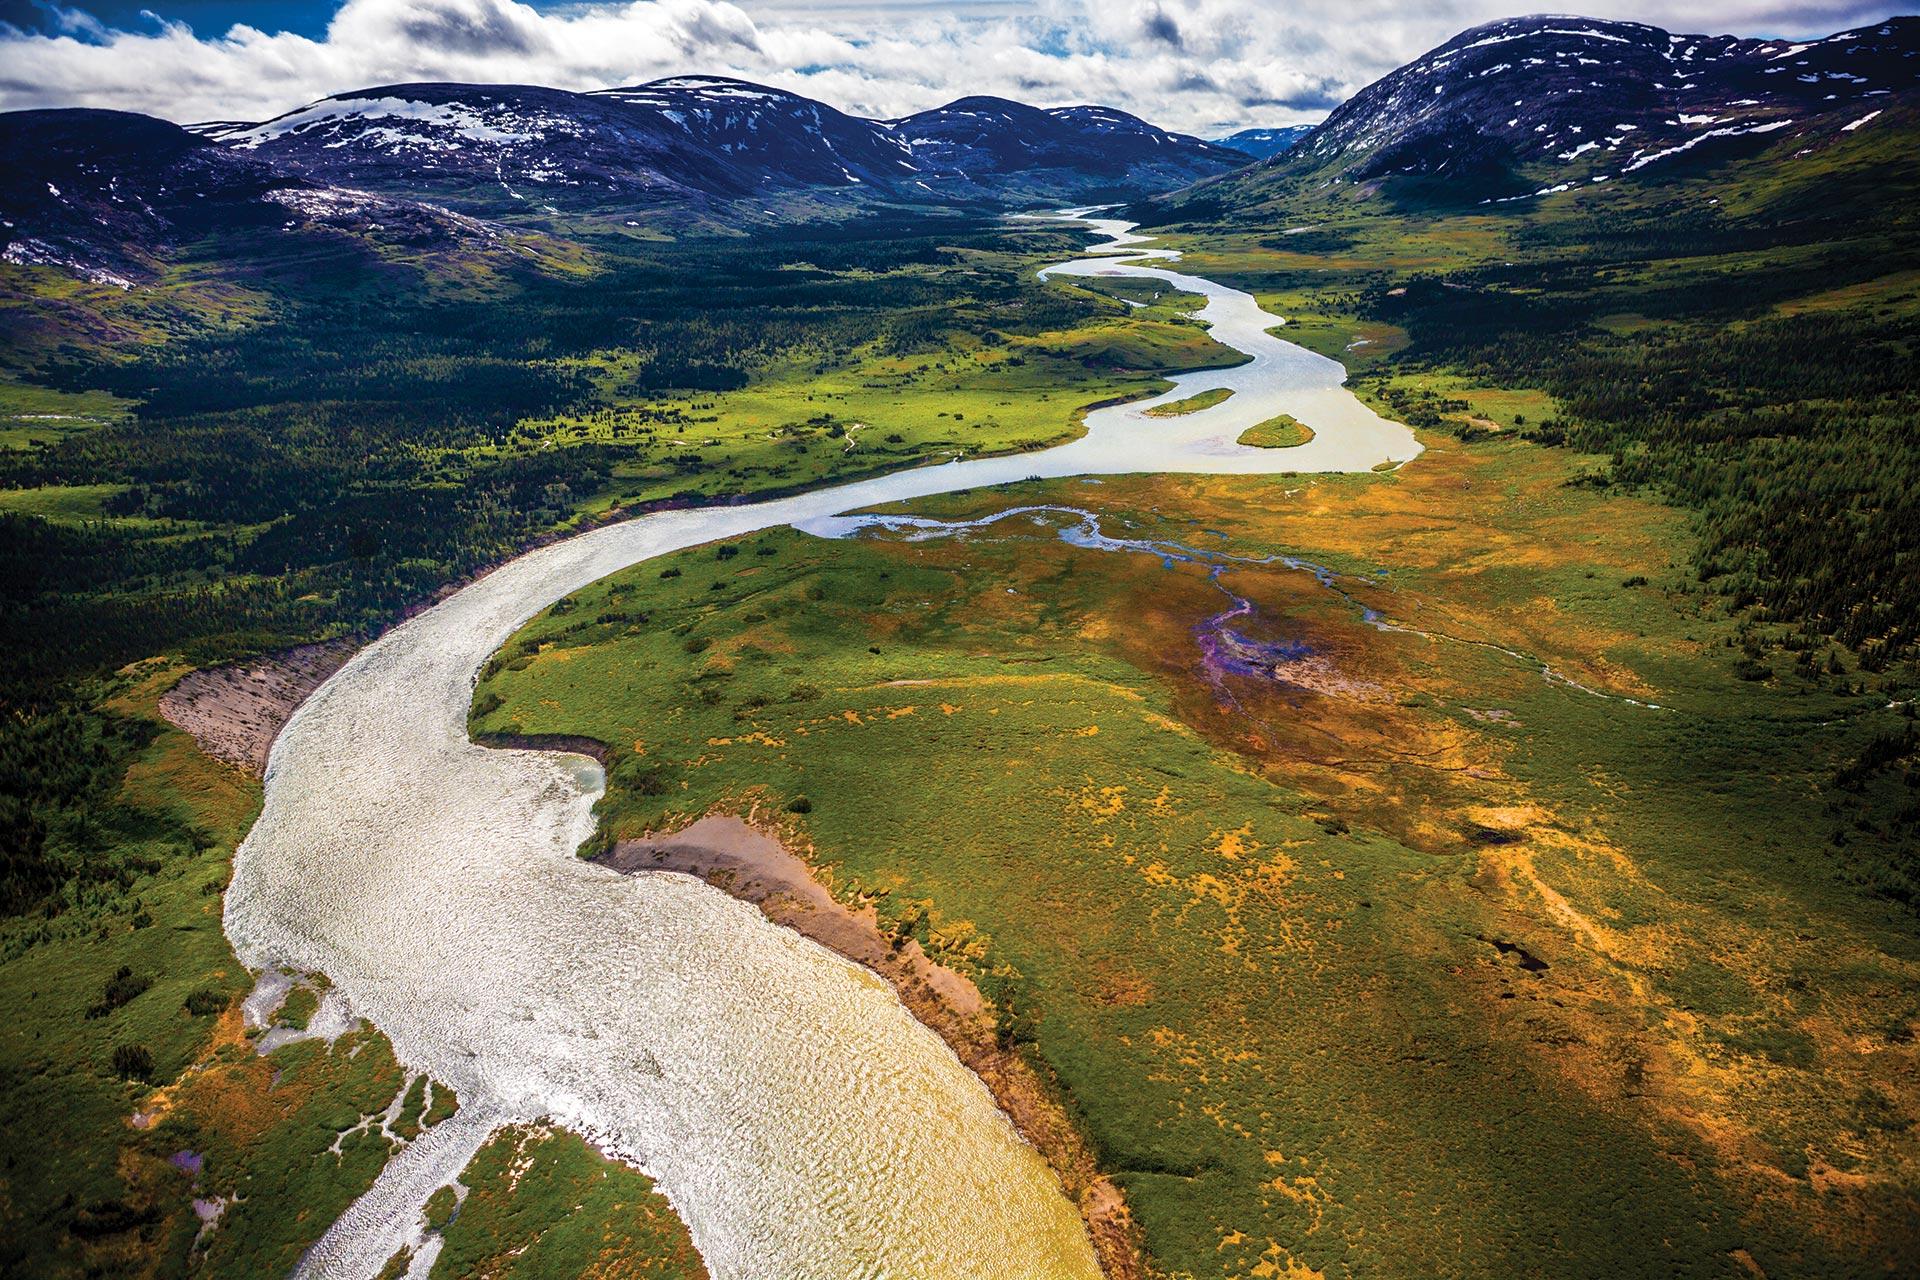 koroc river valley